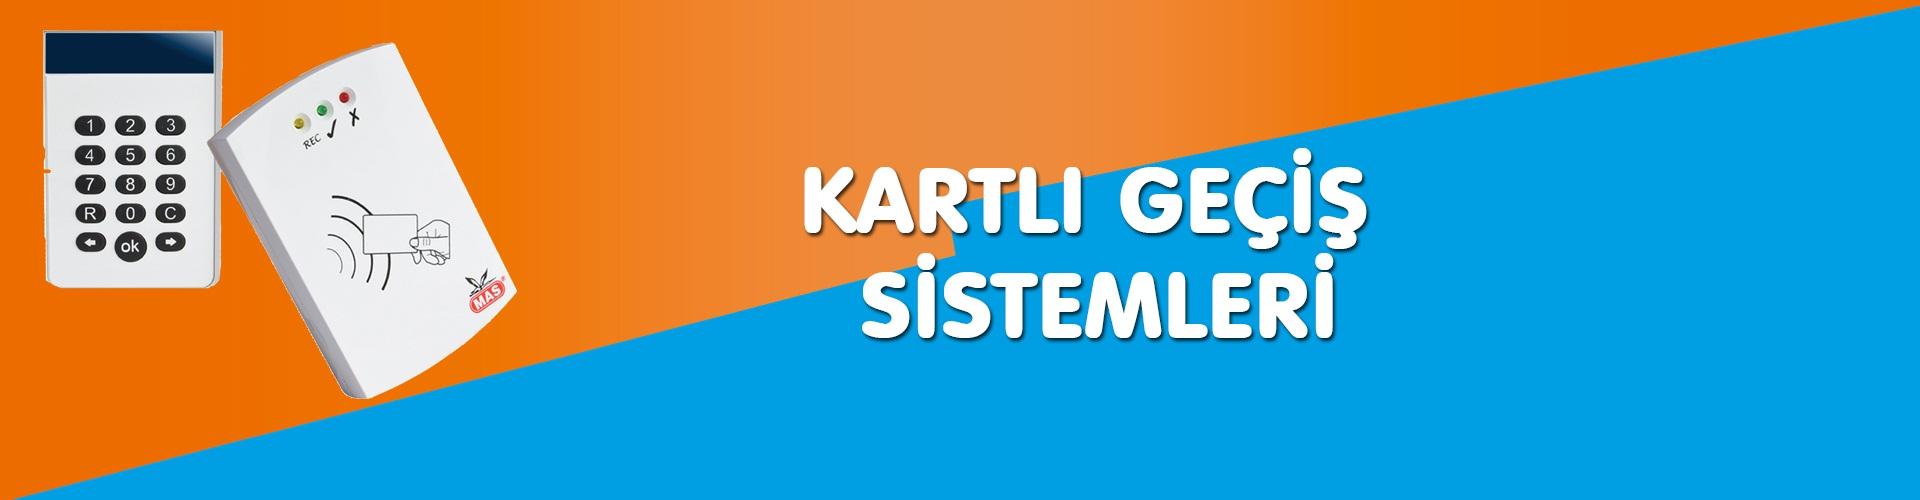 kartli-gecis-sistemleri